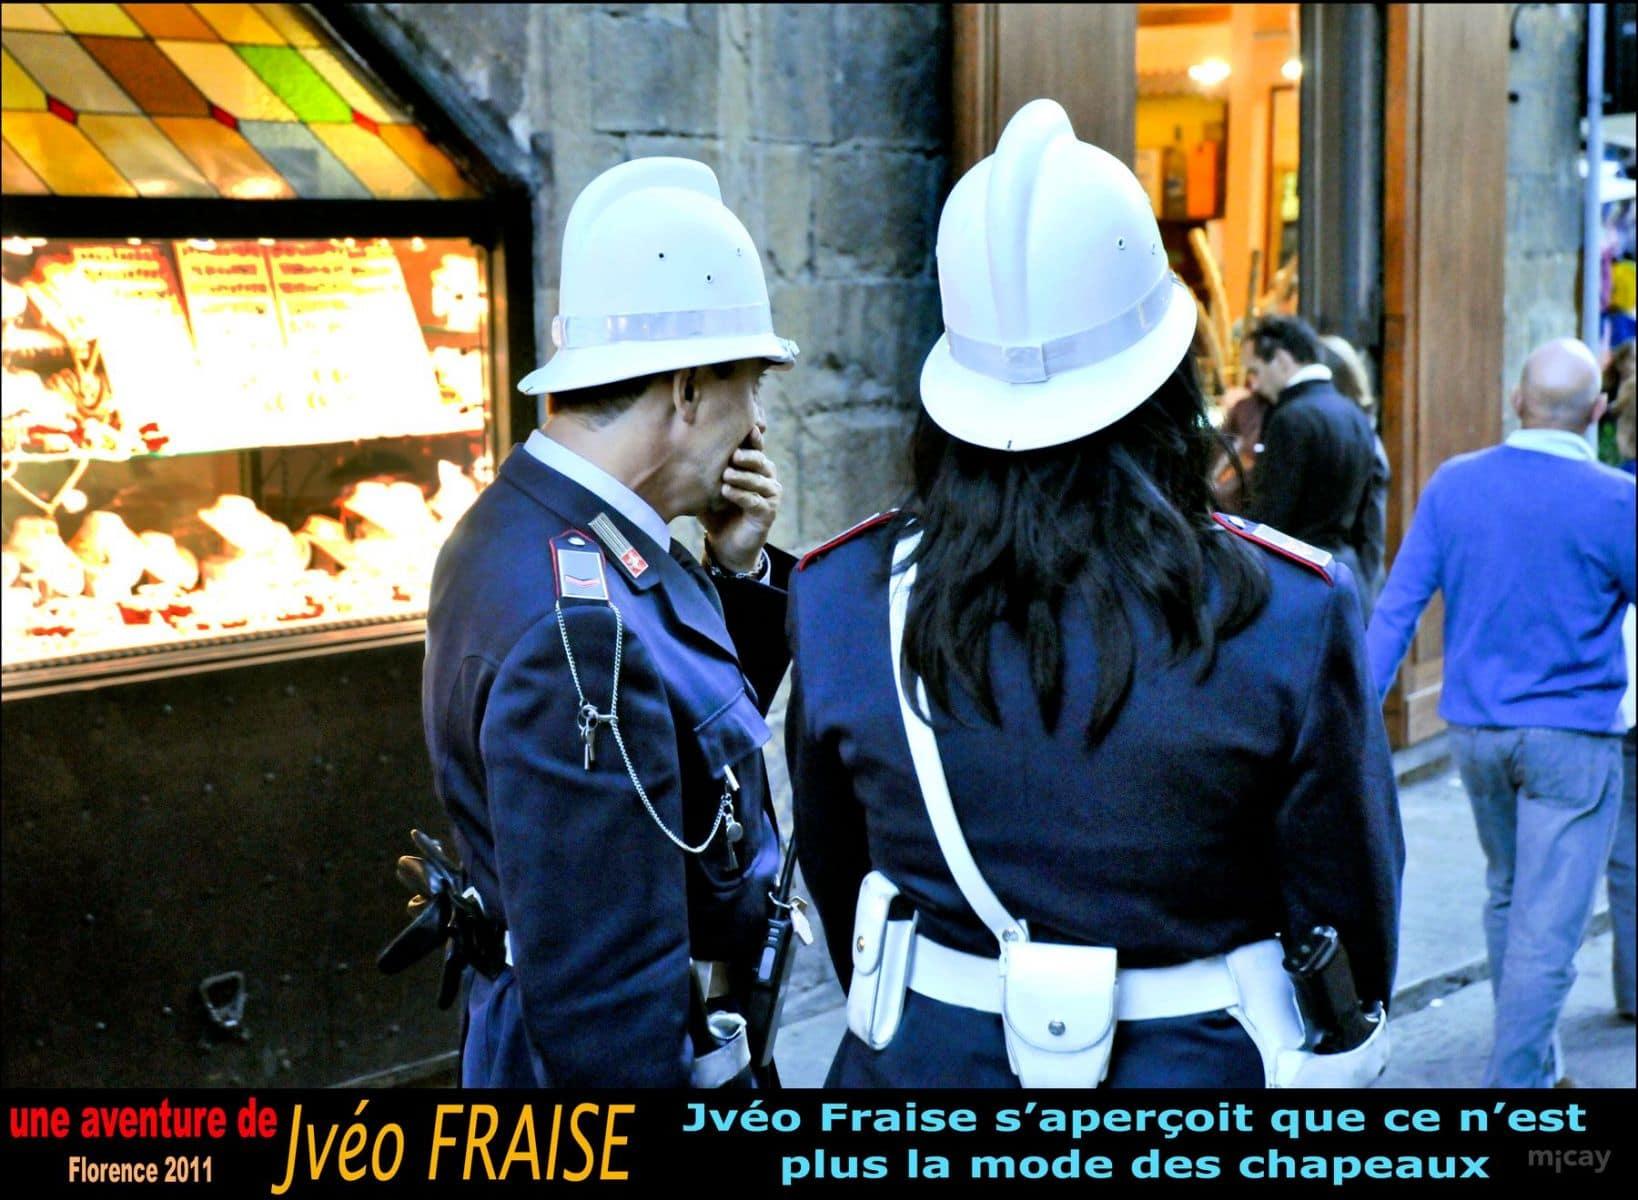 MichelAycaguer-JveoFraise-streetphotography-29